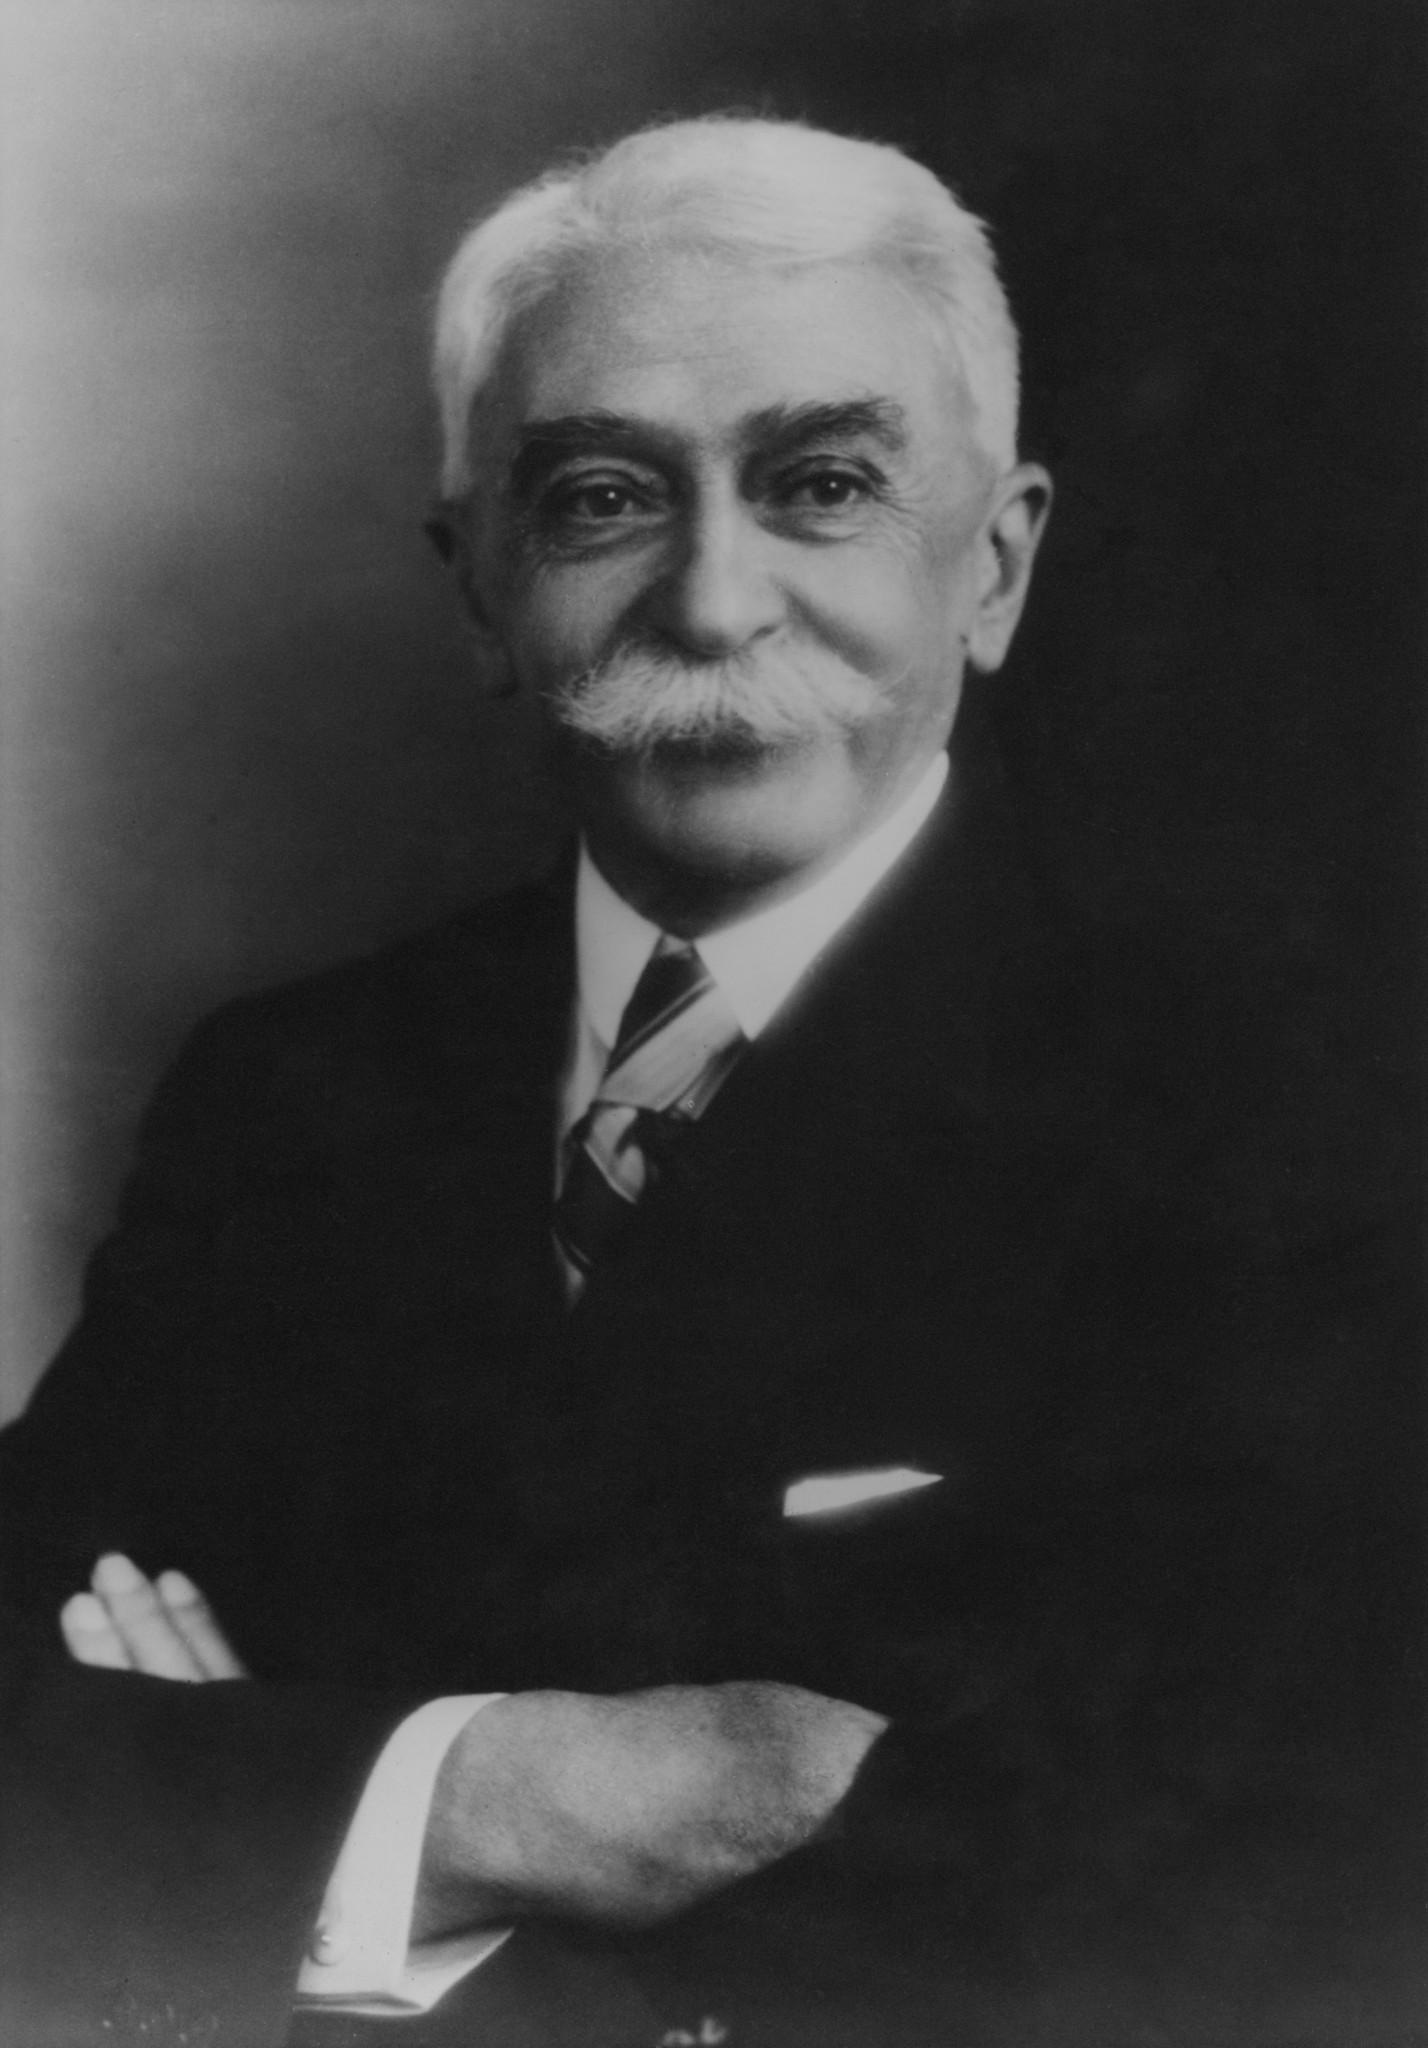 Baron Pierre de Coubertin, circa 1925. Fox Photos/Hulton Archive/Getty Images